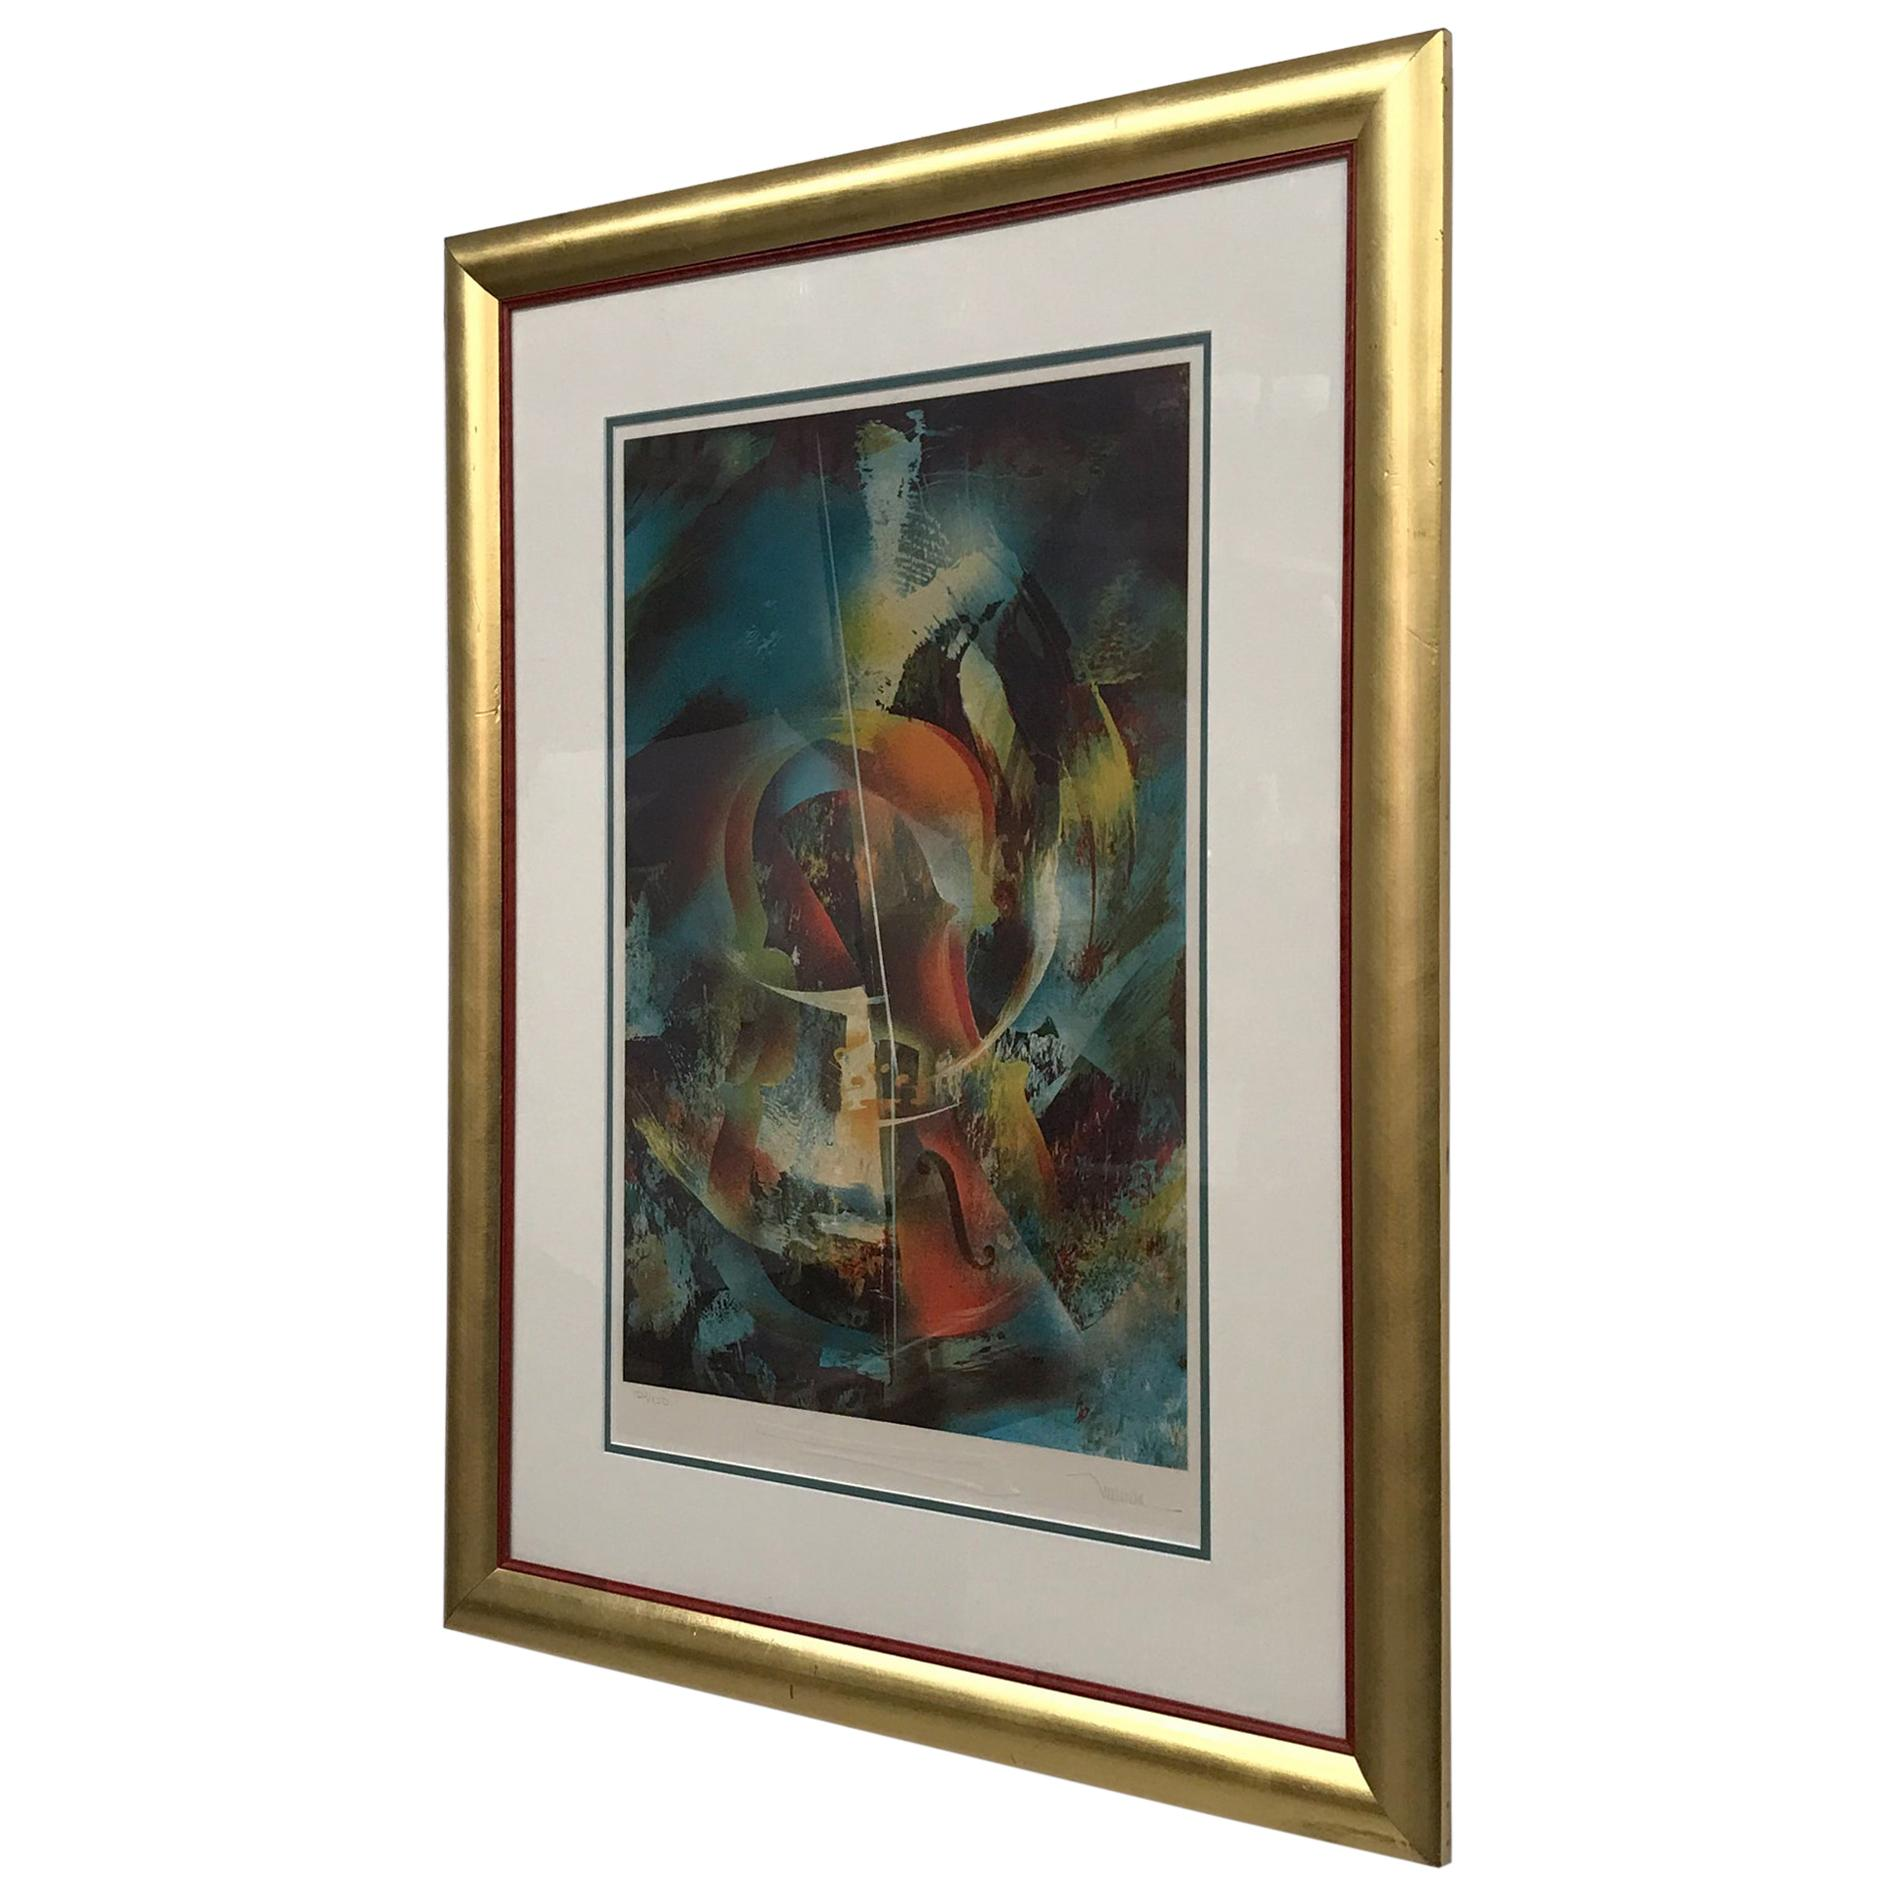 Abstract Wall Art Leonardo Nierman Lithograph #1 Signed 154/200